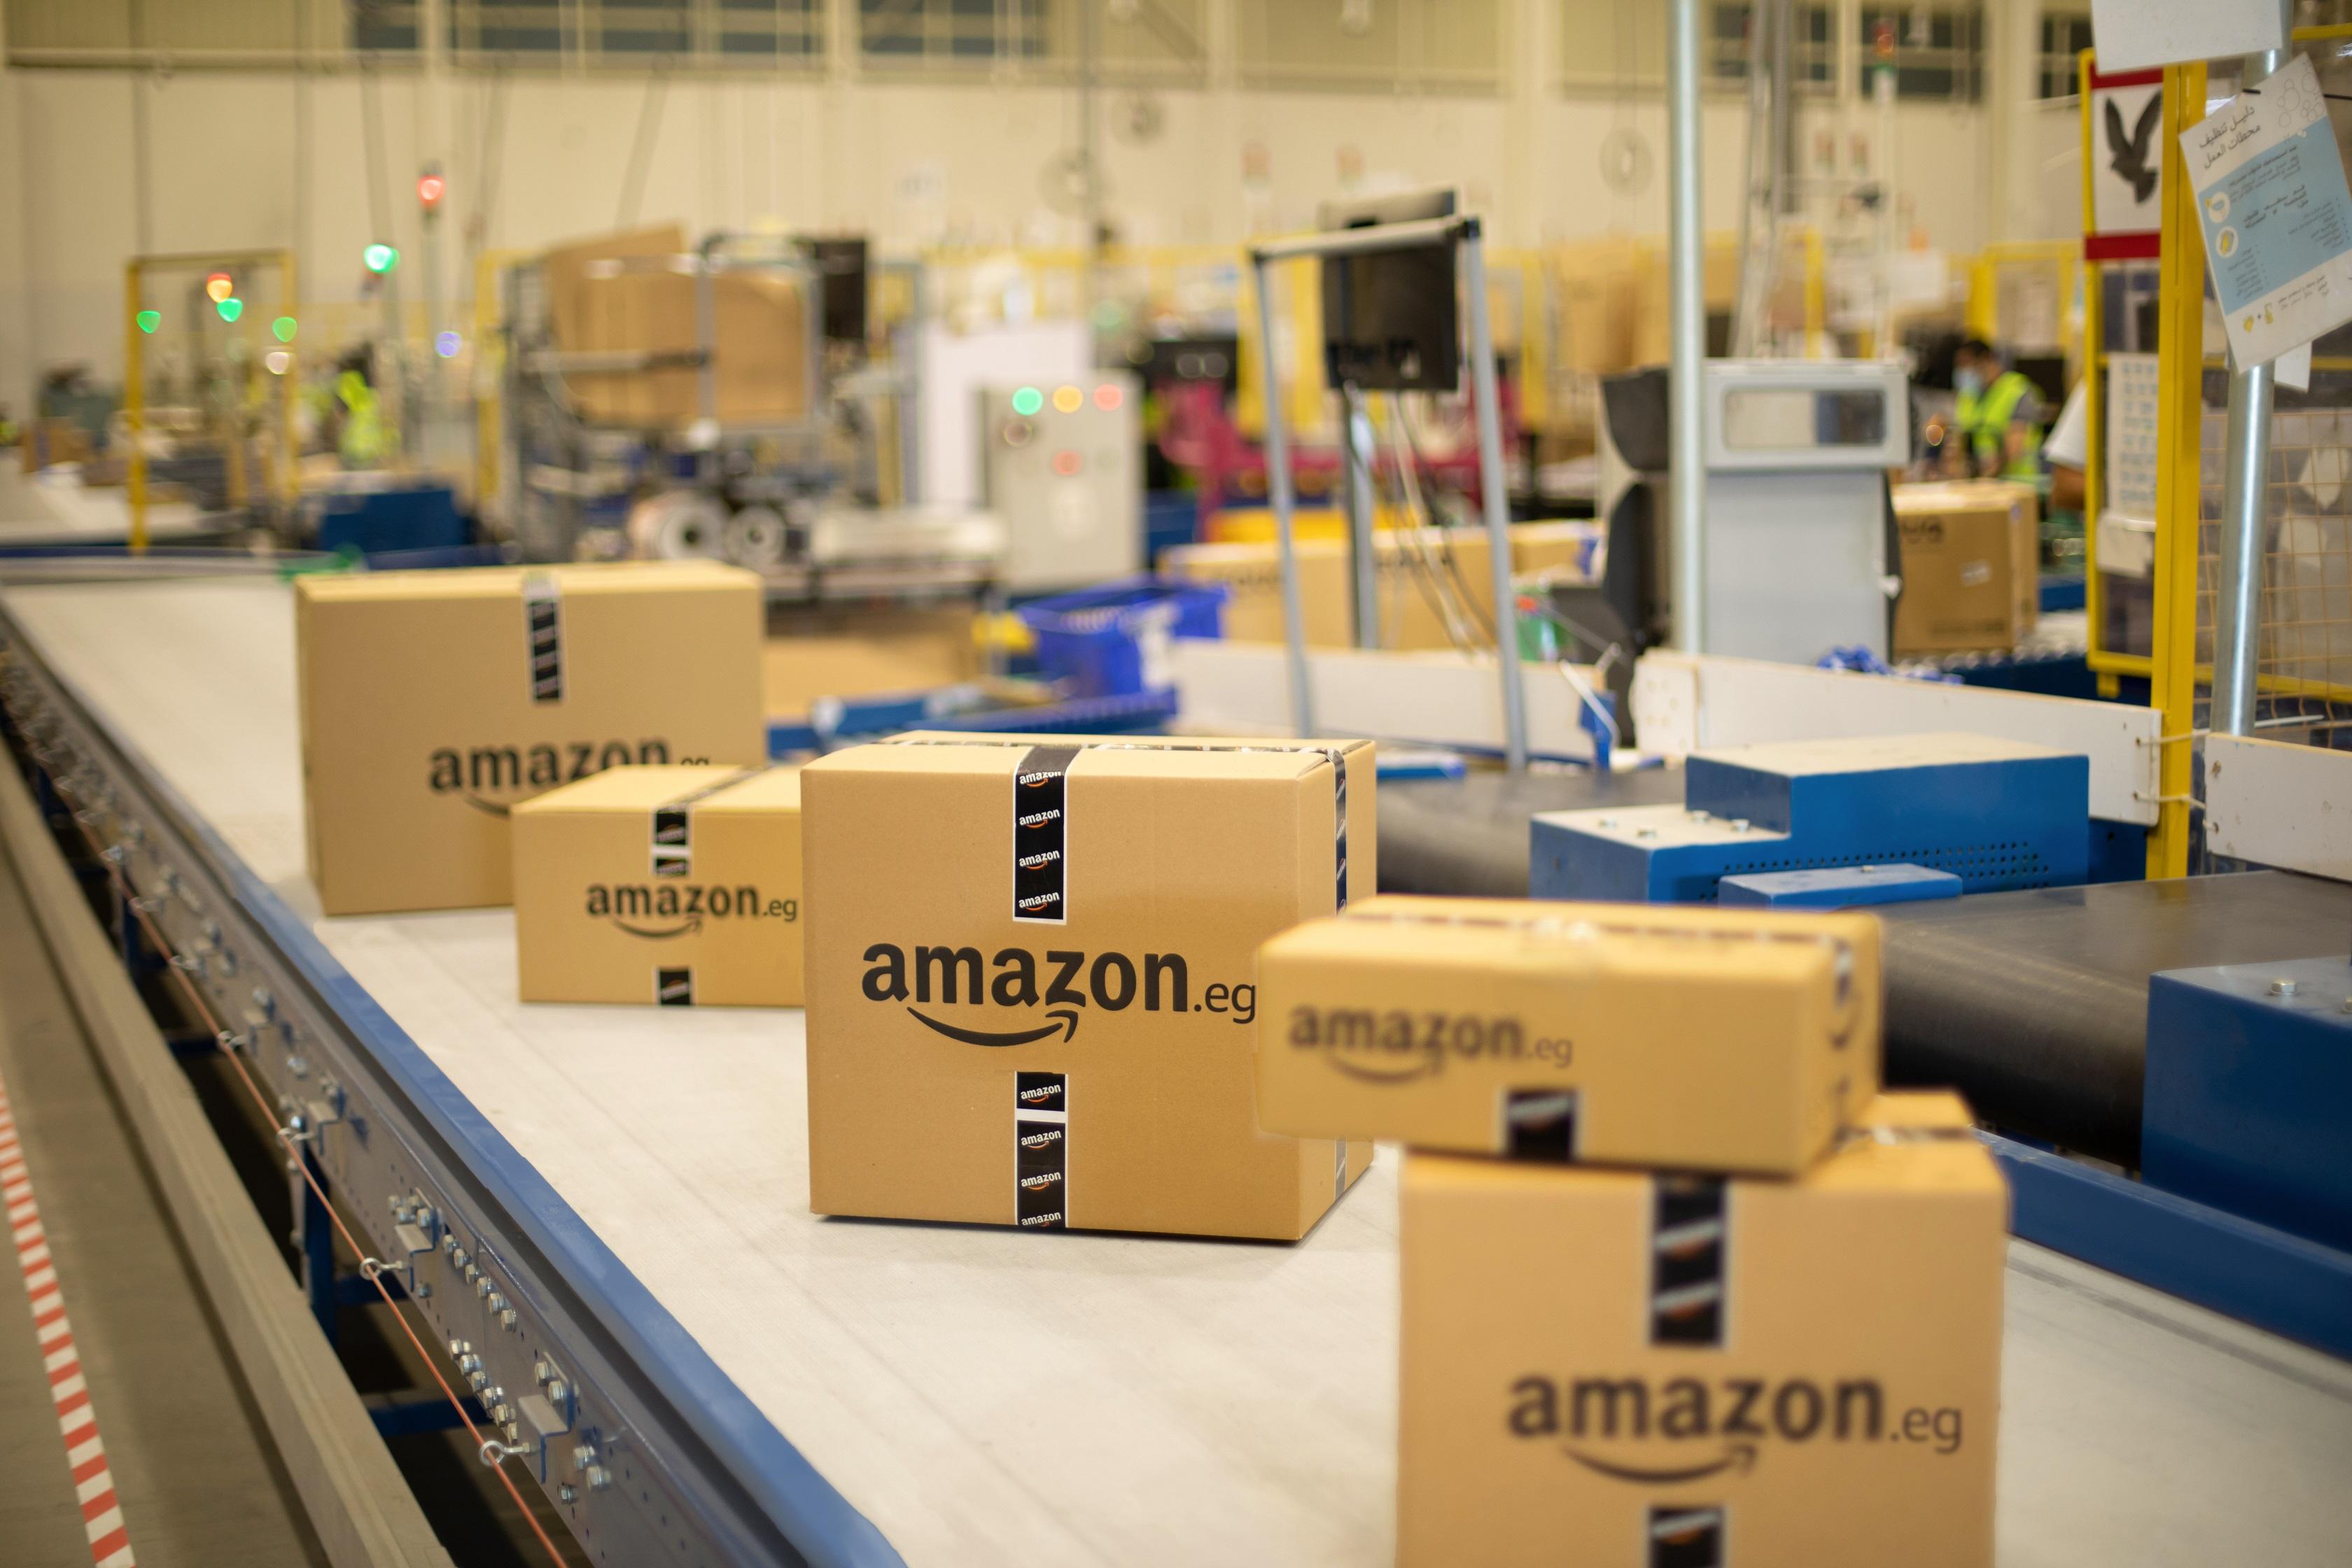 Amazon launches Amazon.eg in Egypt (3)